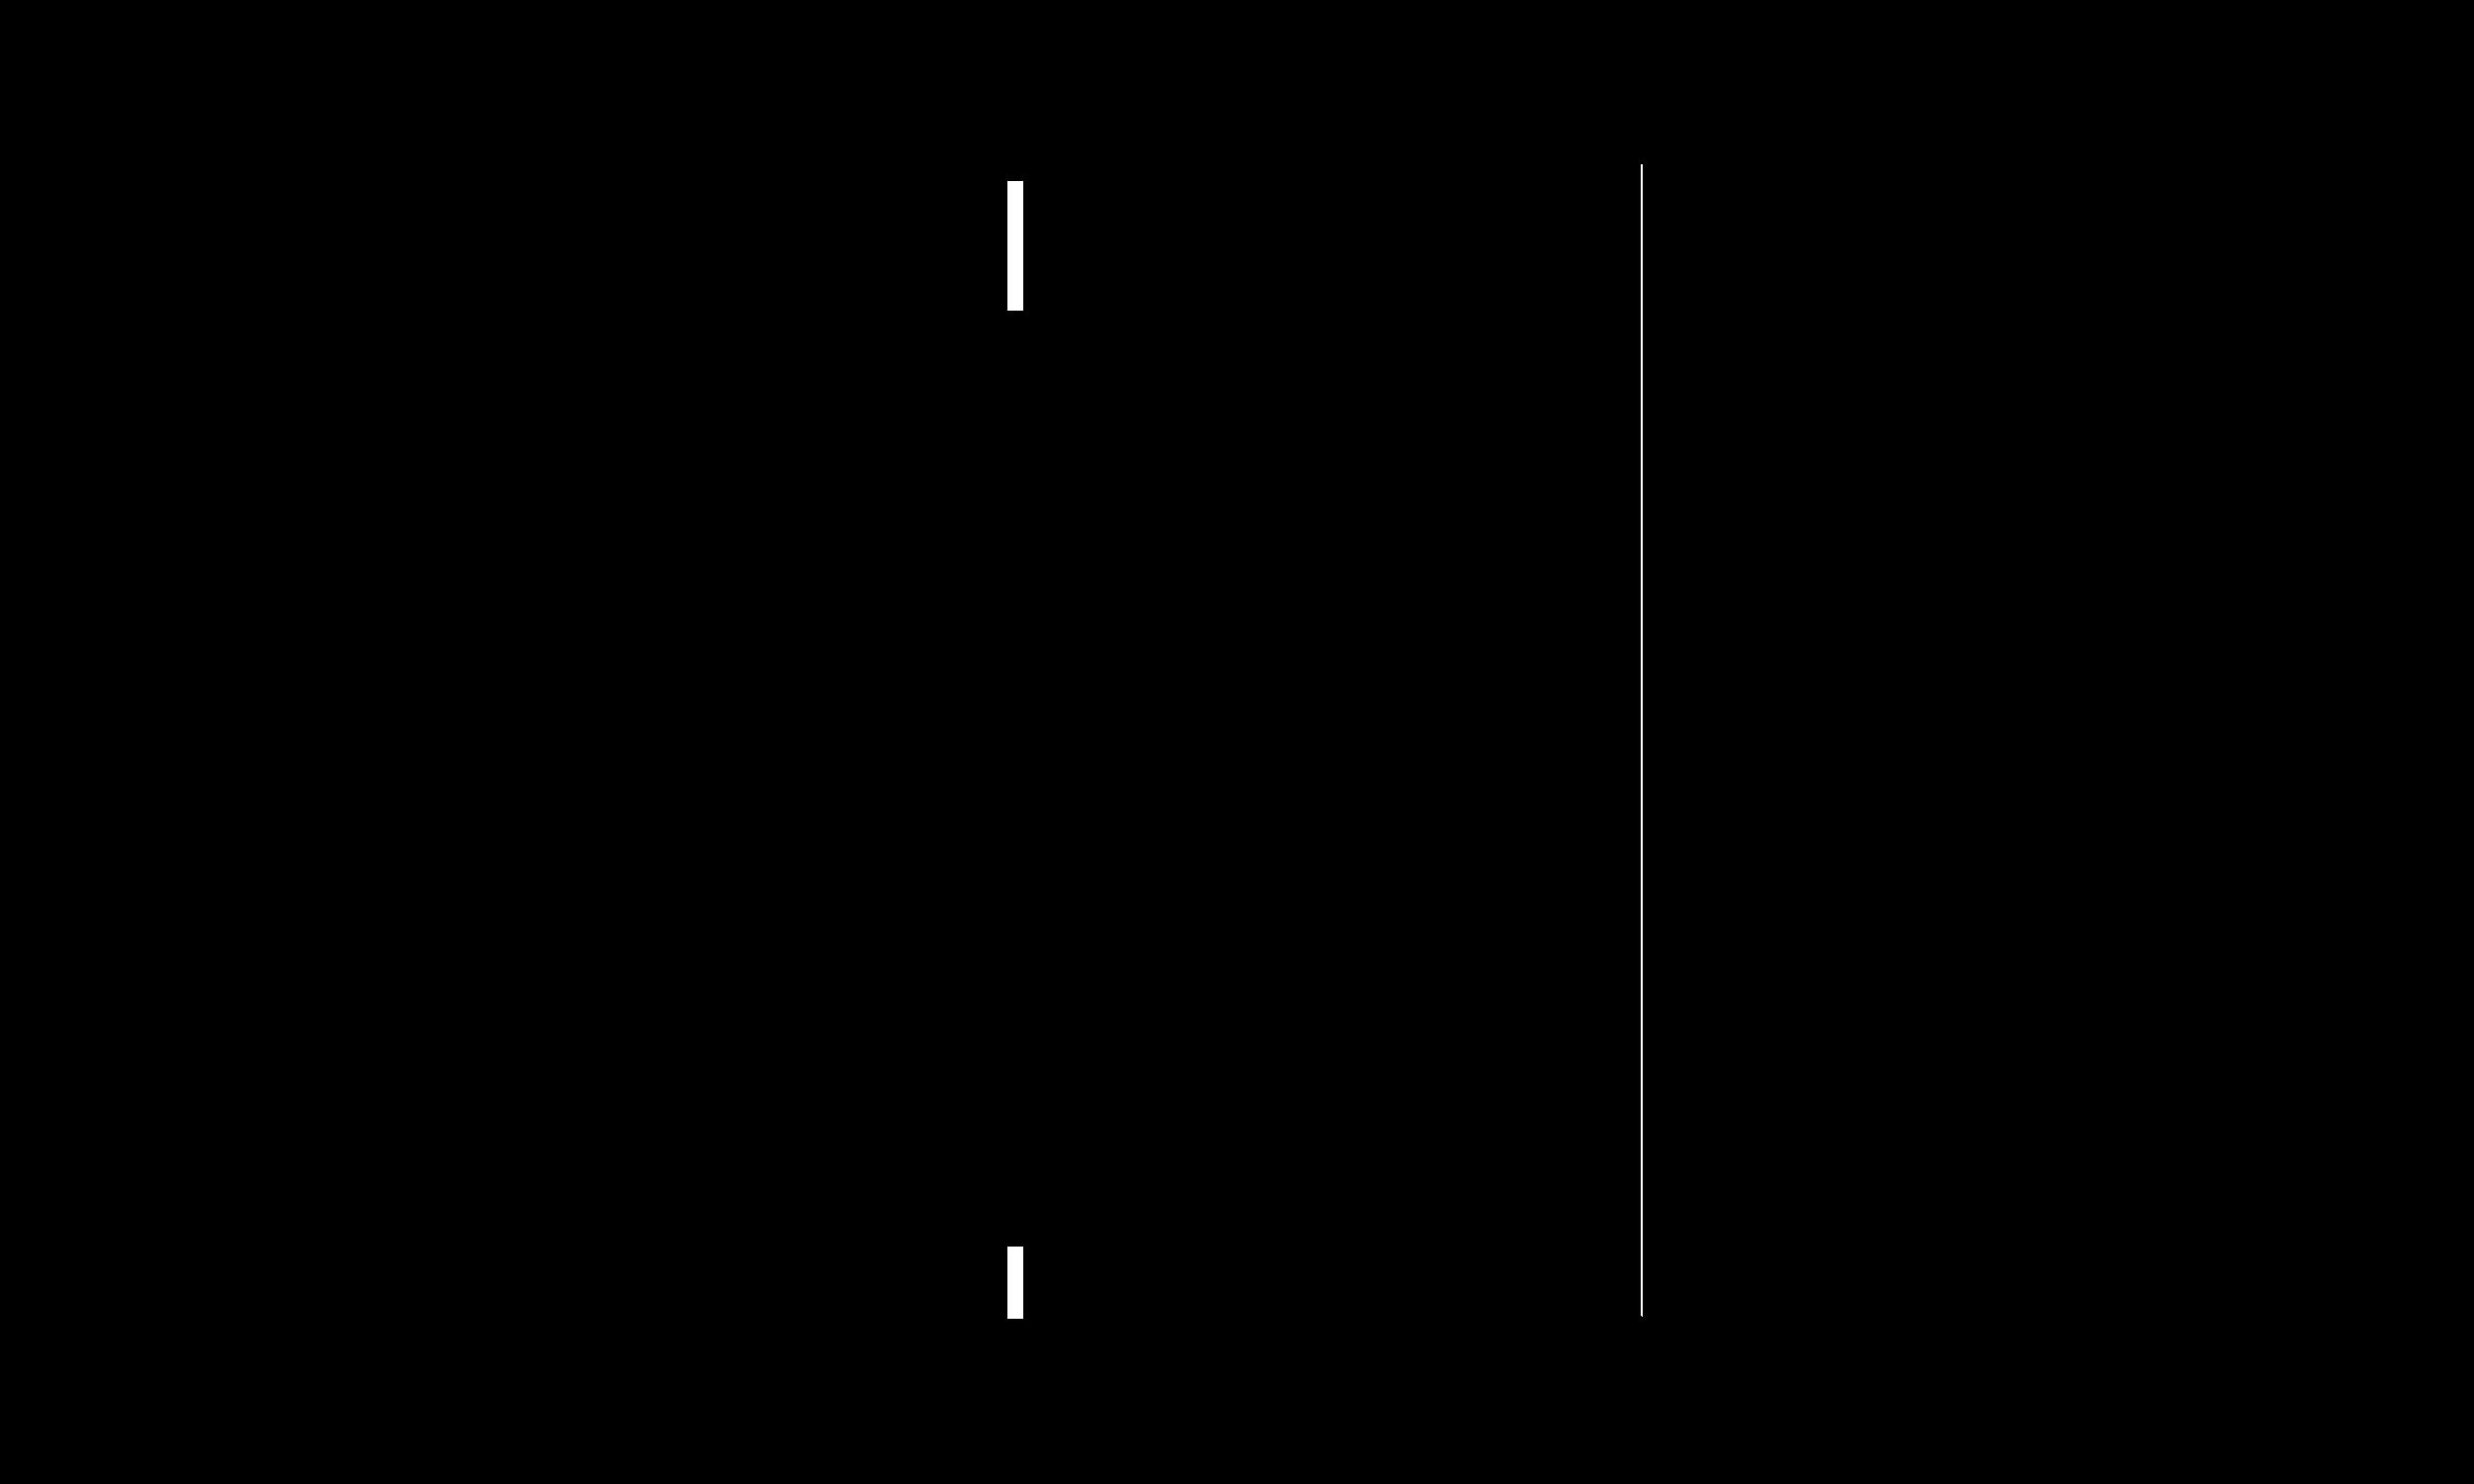 revco lato logo # 1.png